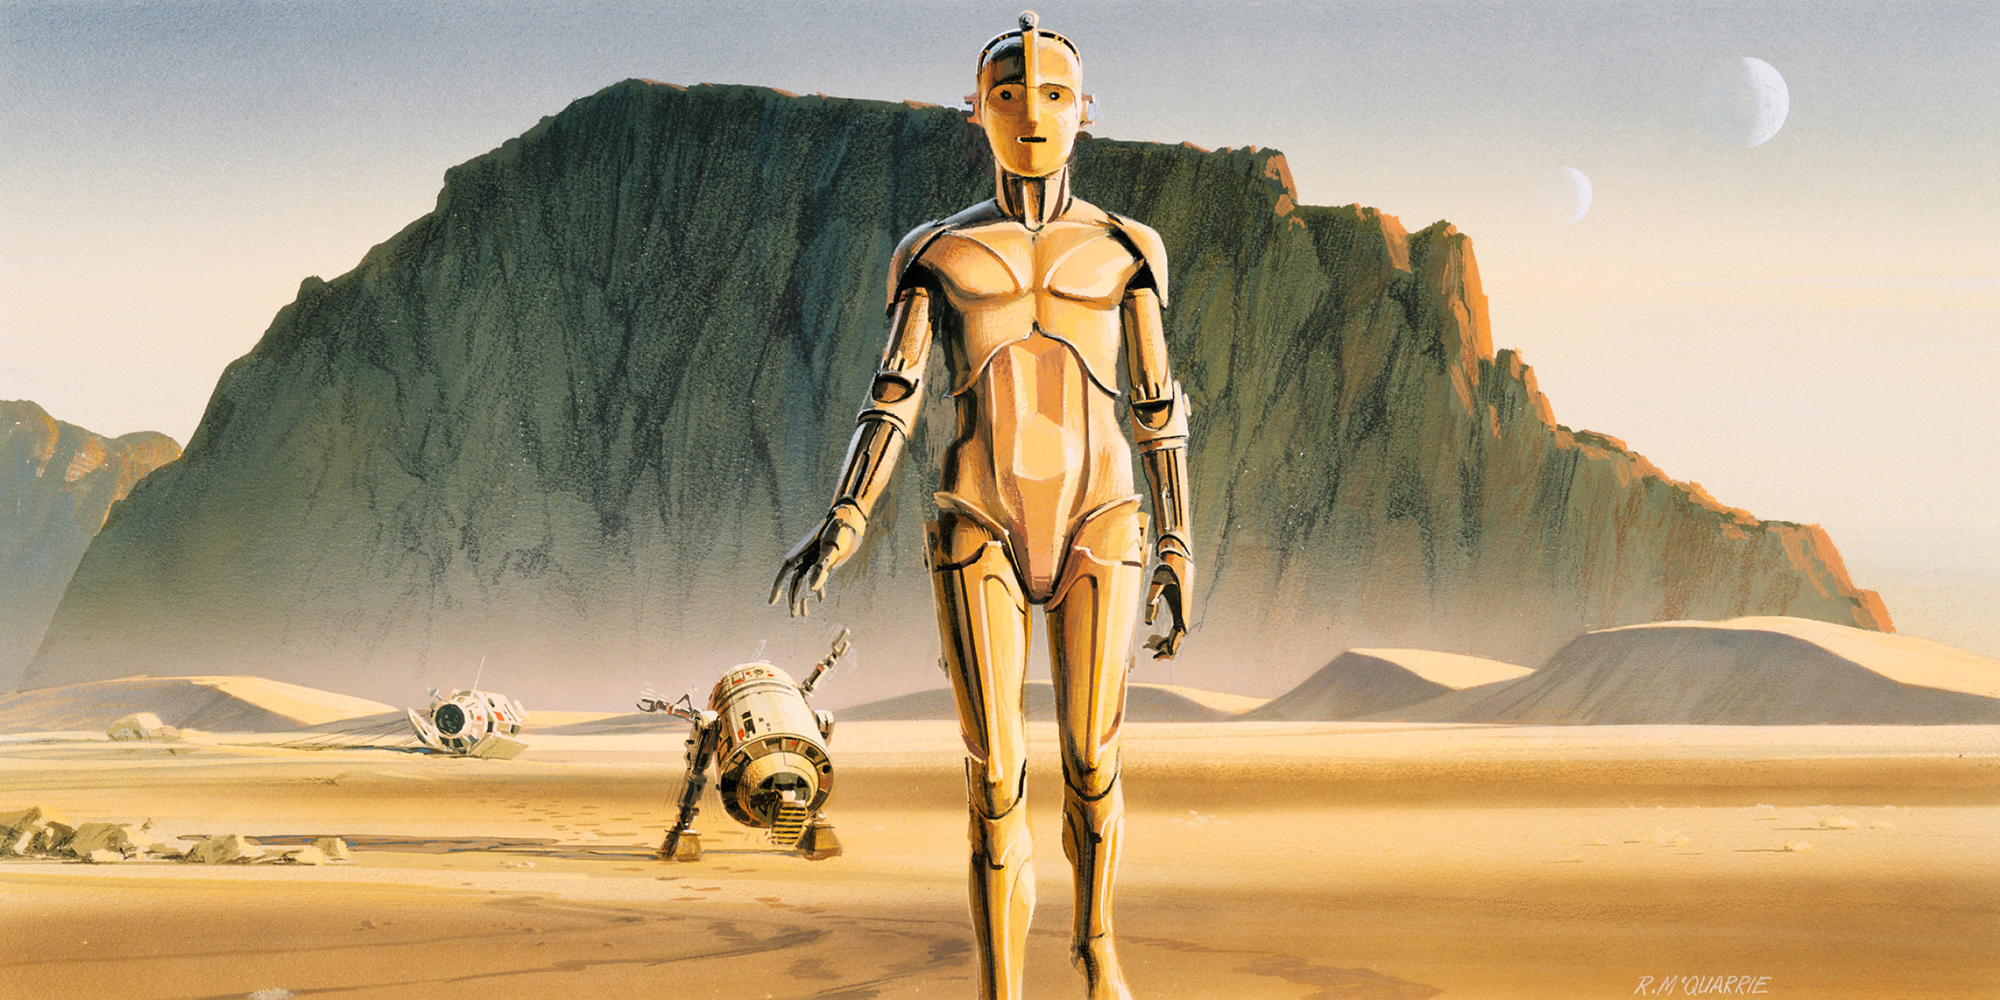 Ralph Mcquarrie y el espectacular concept art de Star Wars